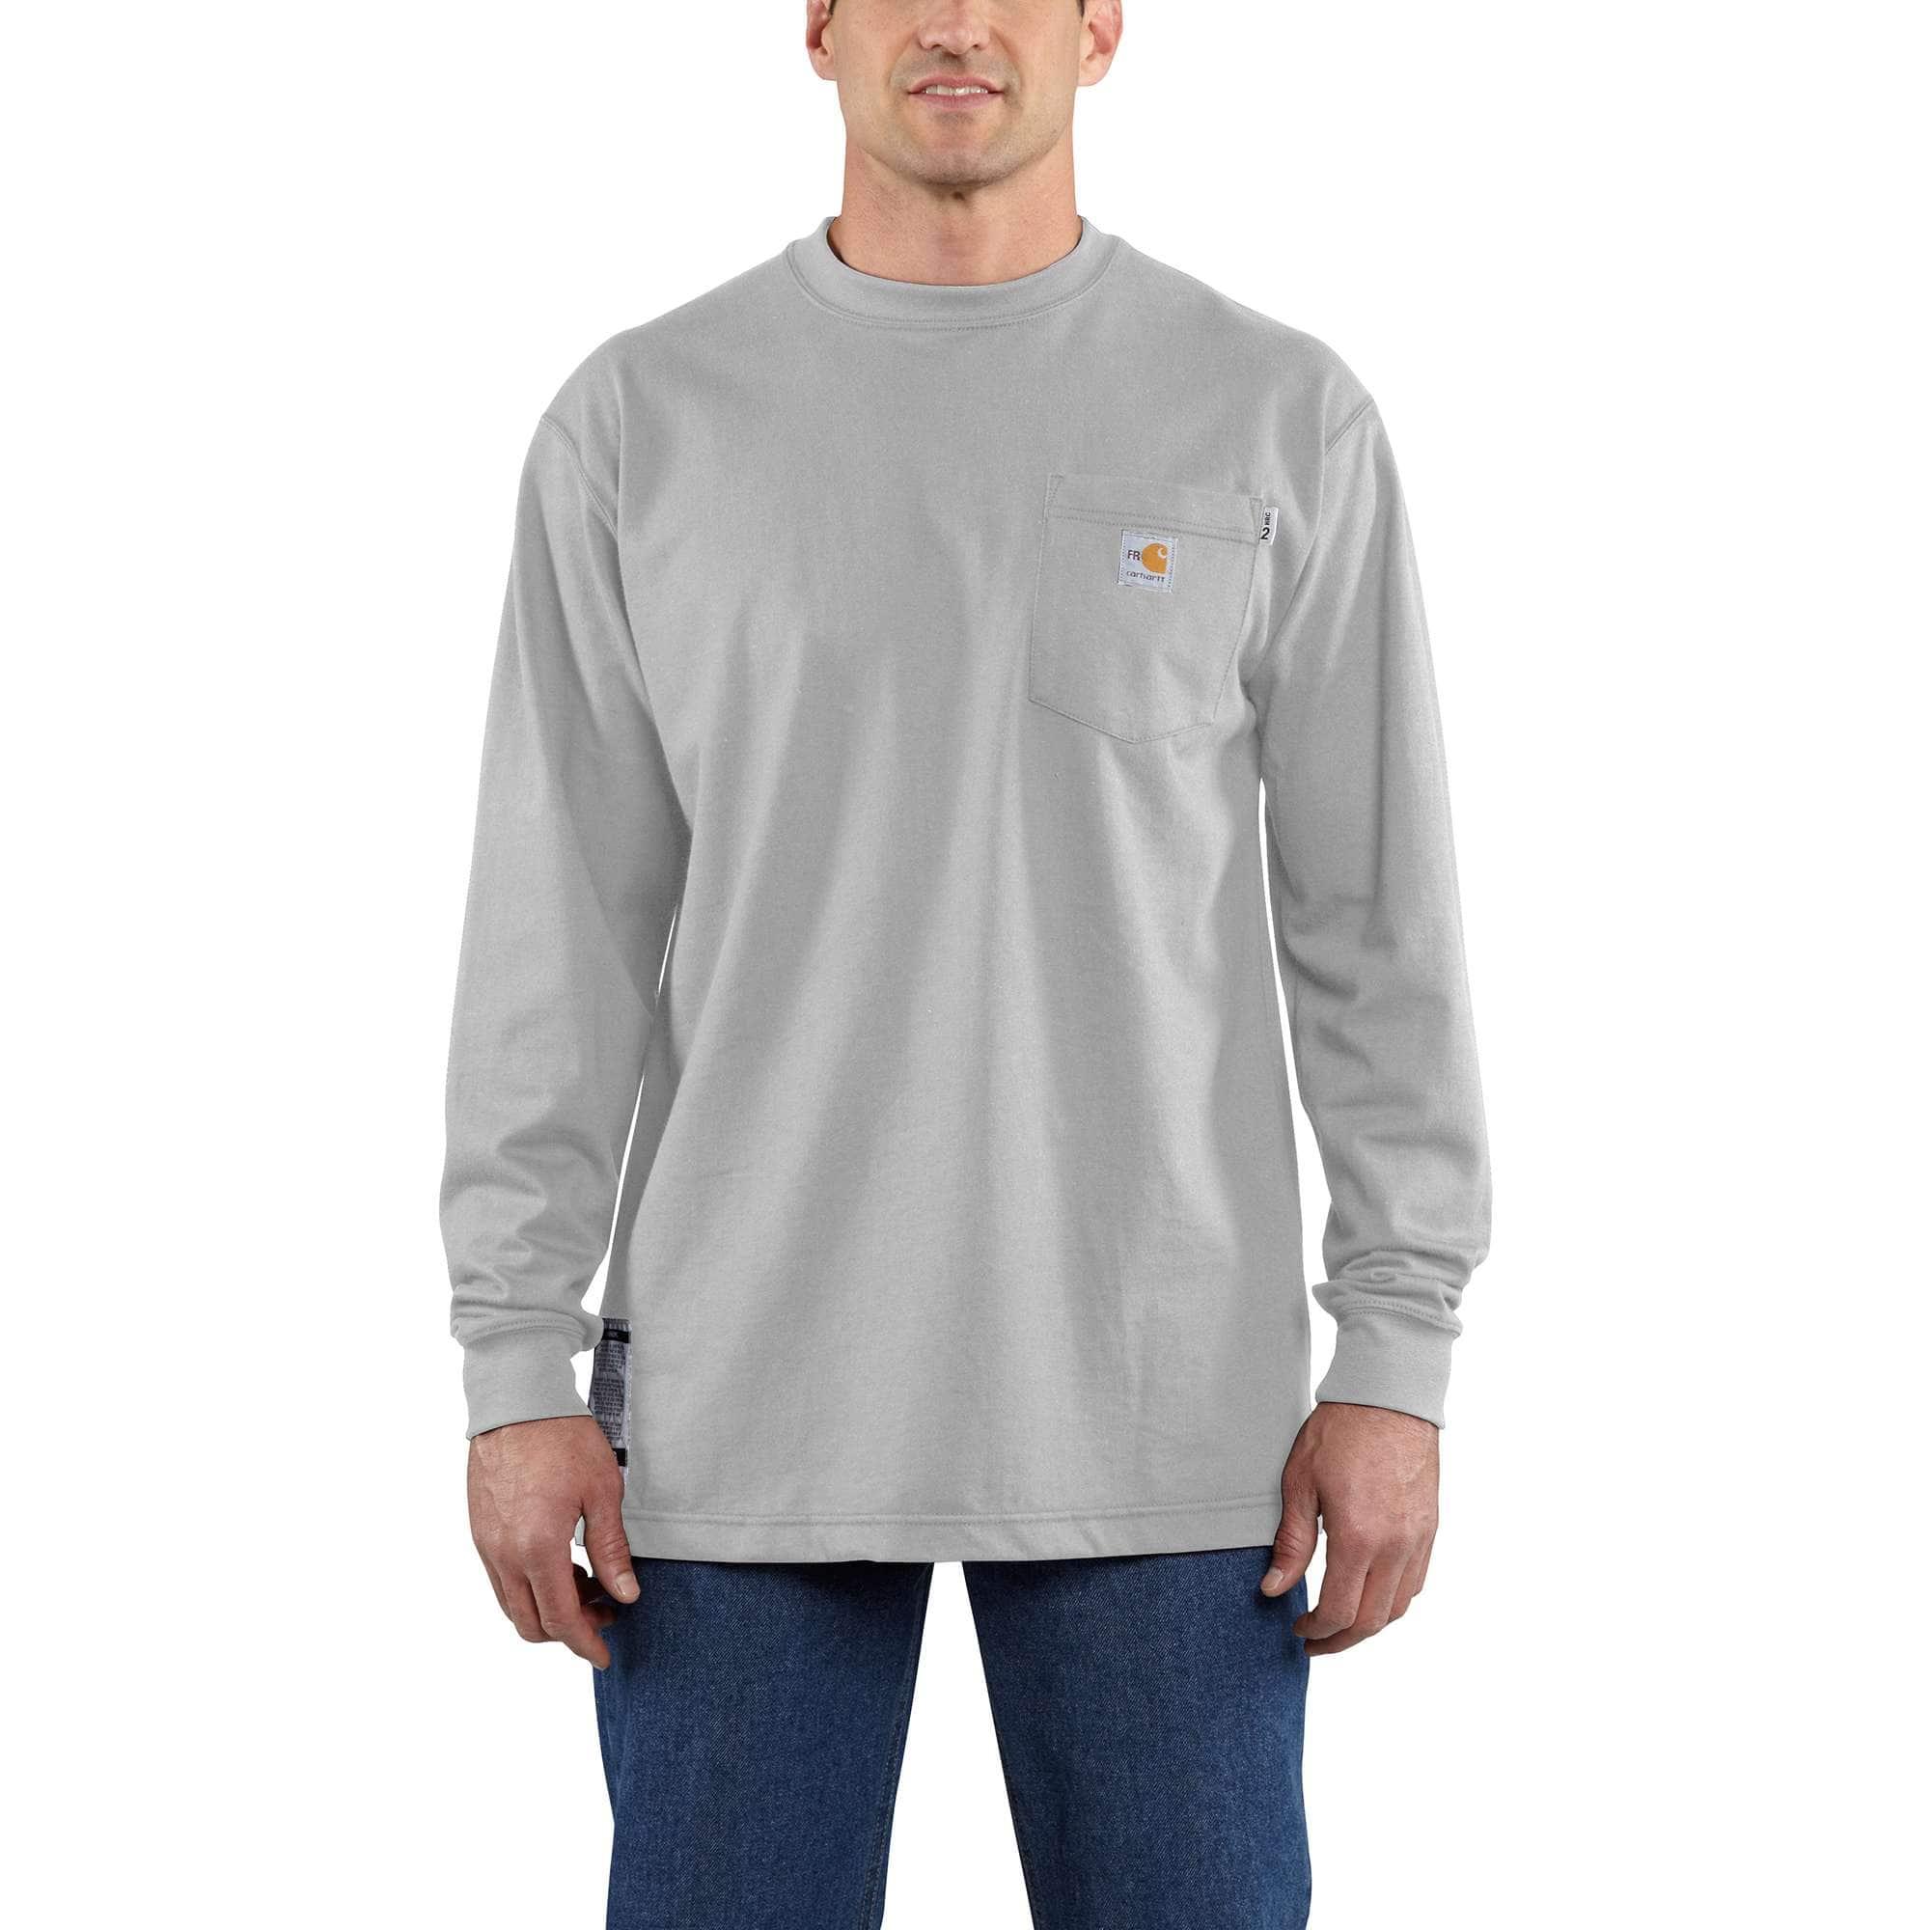 221476c1342b Men s Flame-Resistant Carhartt Force® Cotton Long-Sleeve T-Shirt ...